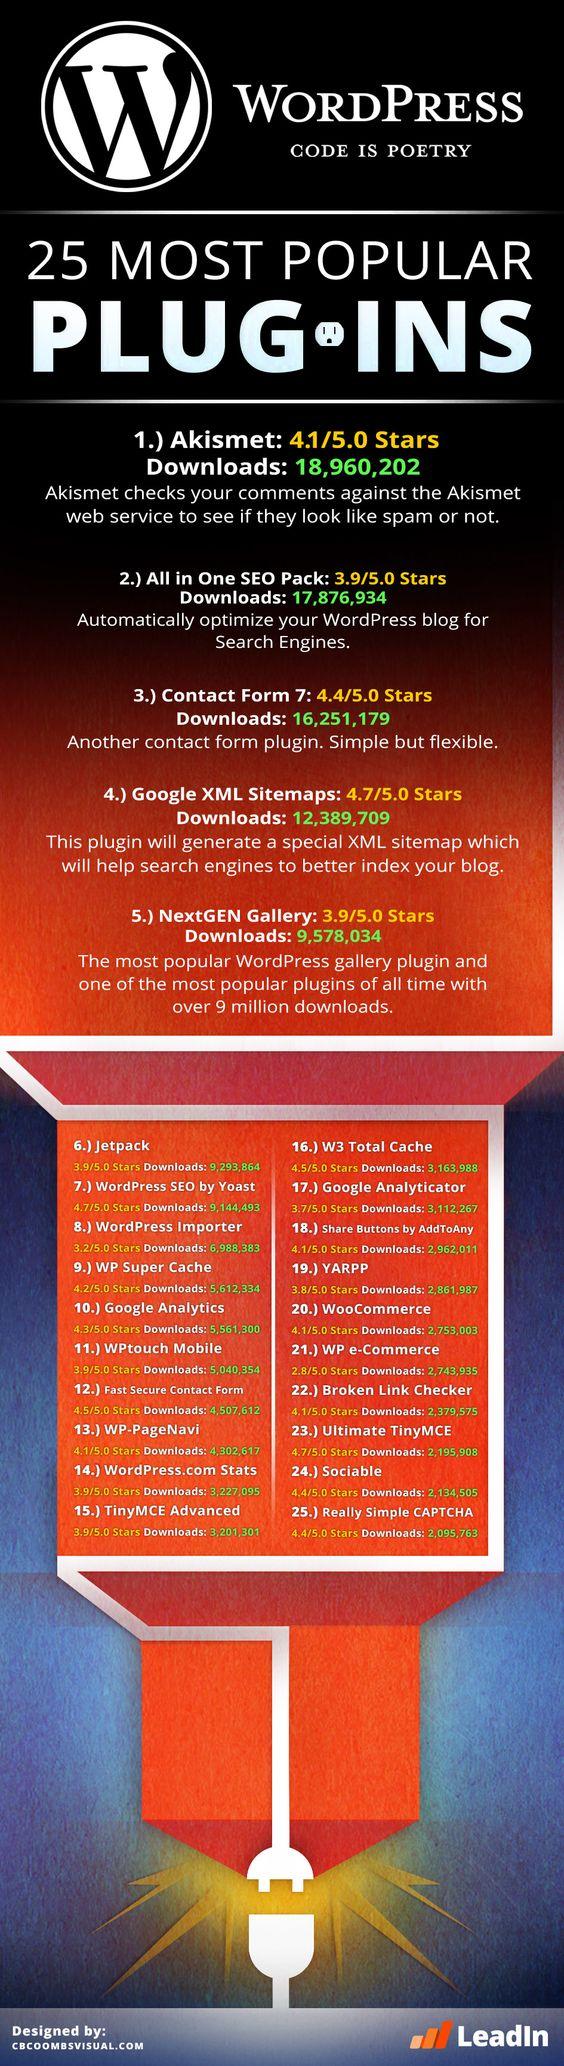 The top 25 WordPress plugins